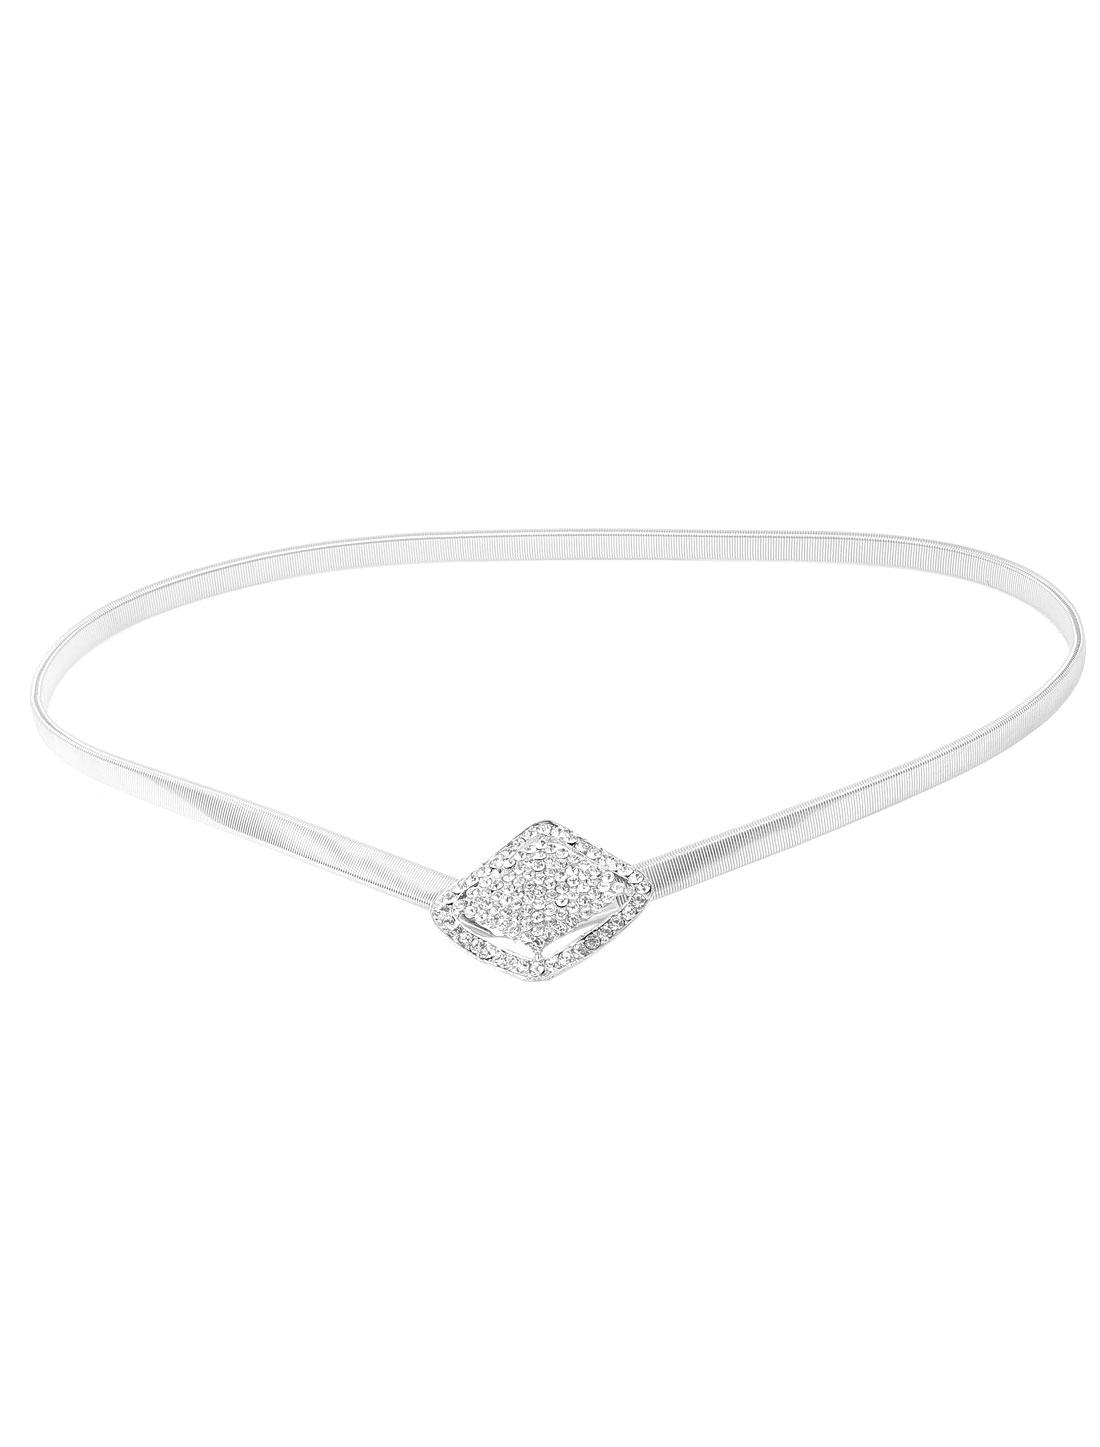 Silver Tone Rhinestone Accent Stretch Waist Belt for Women